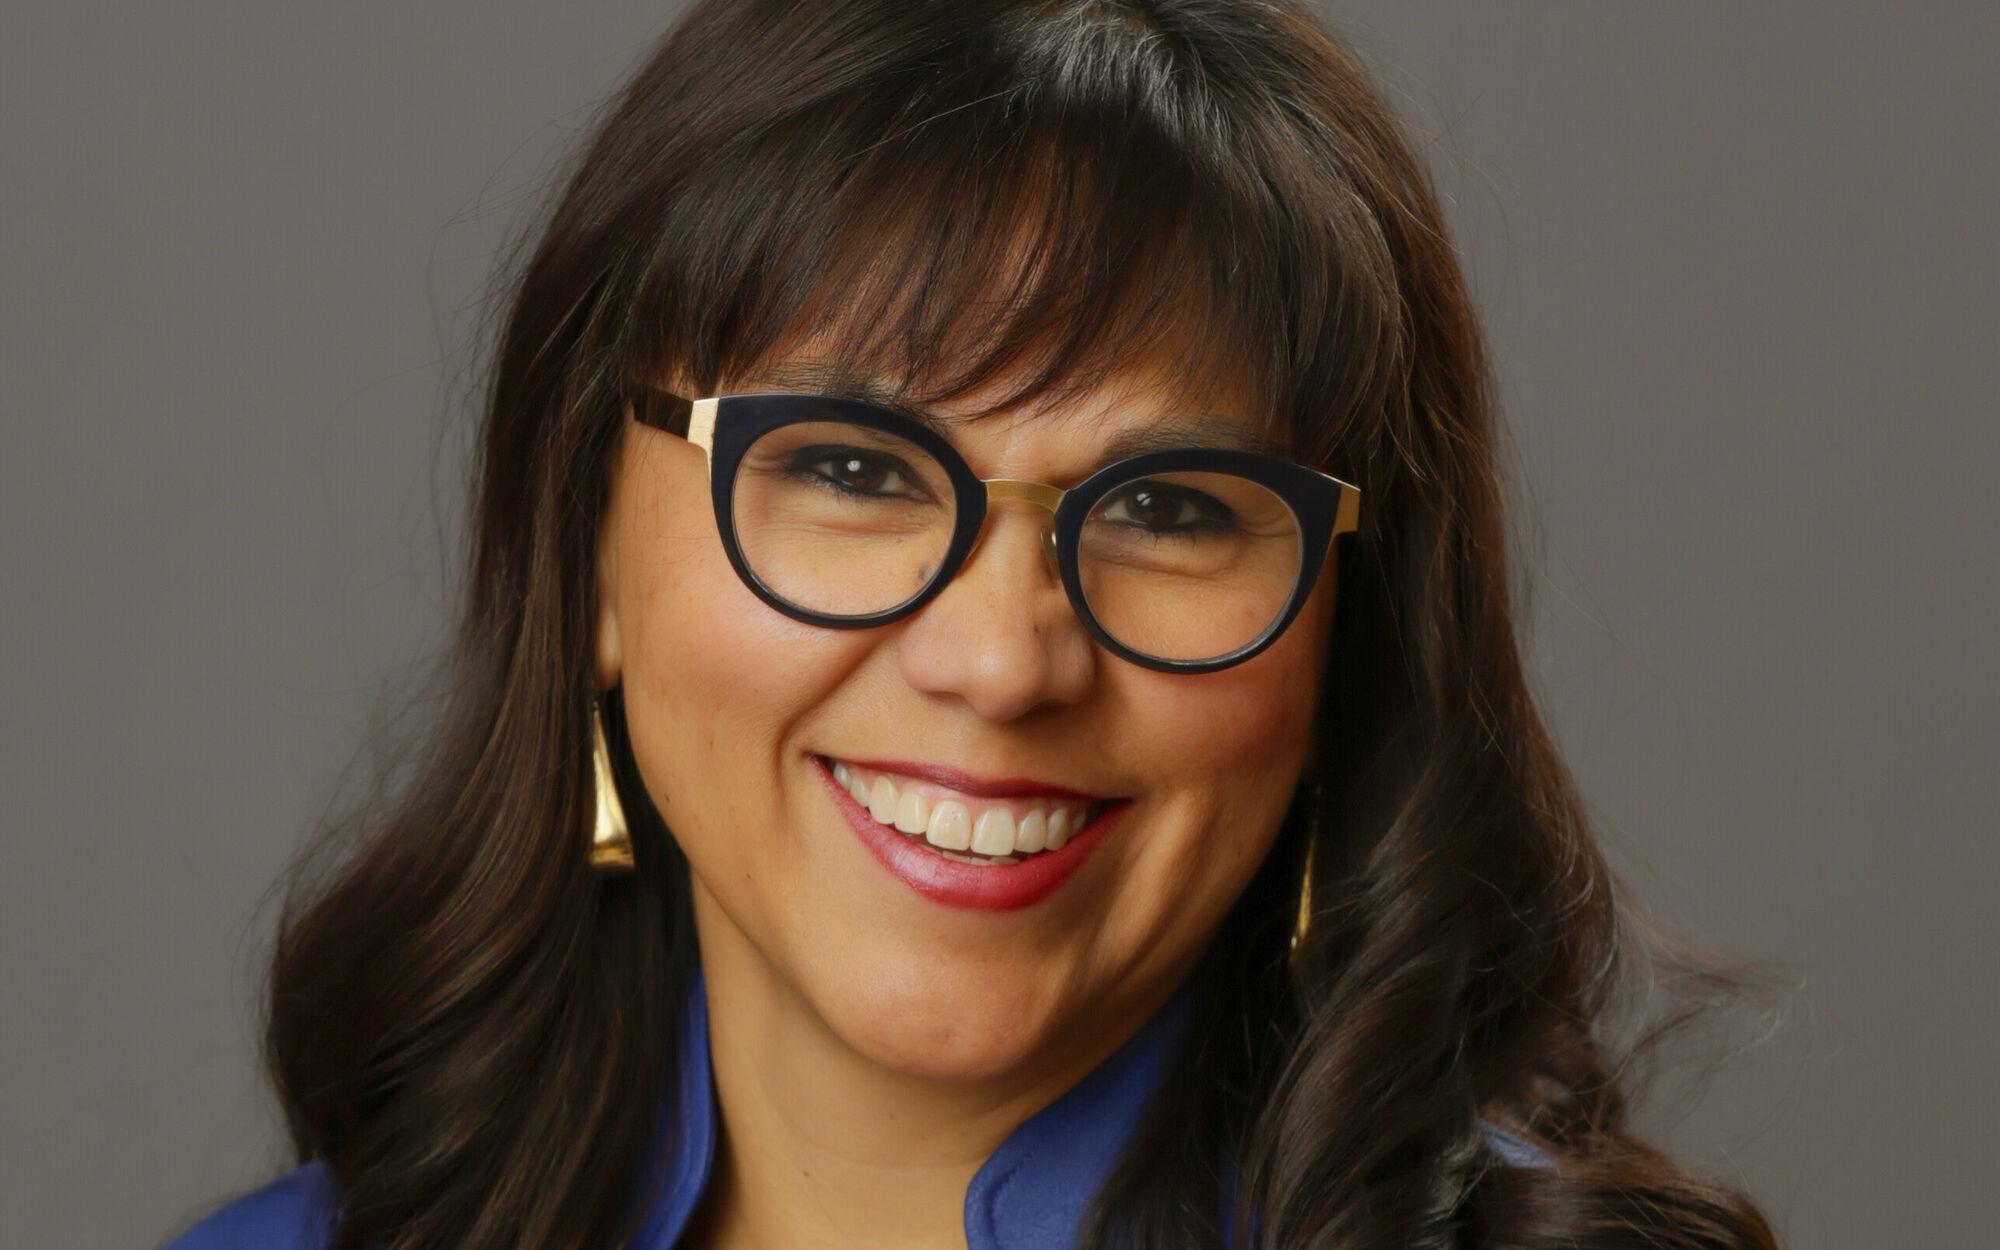 Gloria Perez cropped headshot